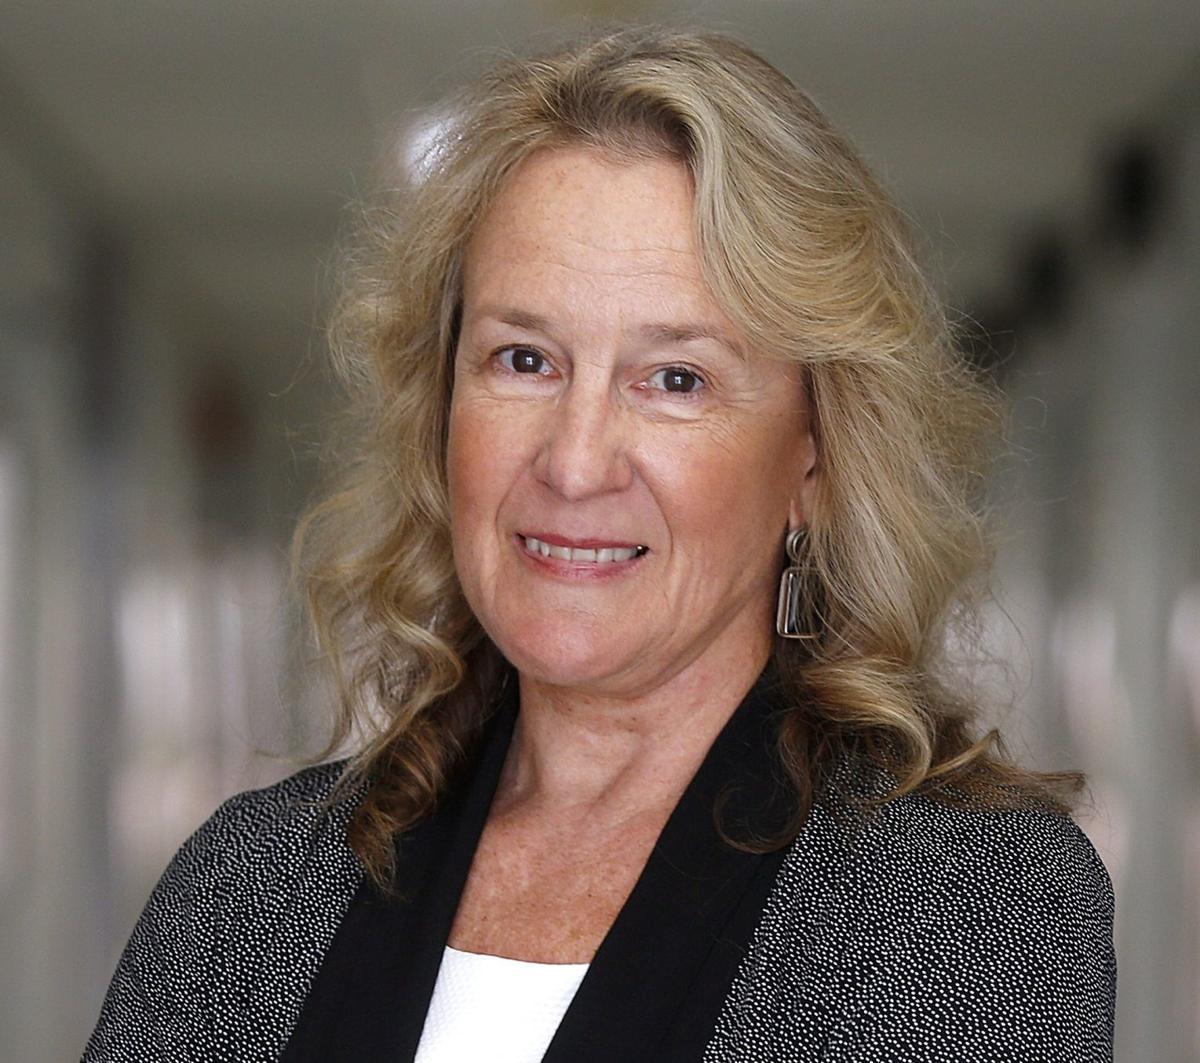 University of Arizona College of Science Carol Barnes